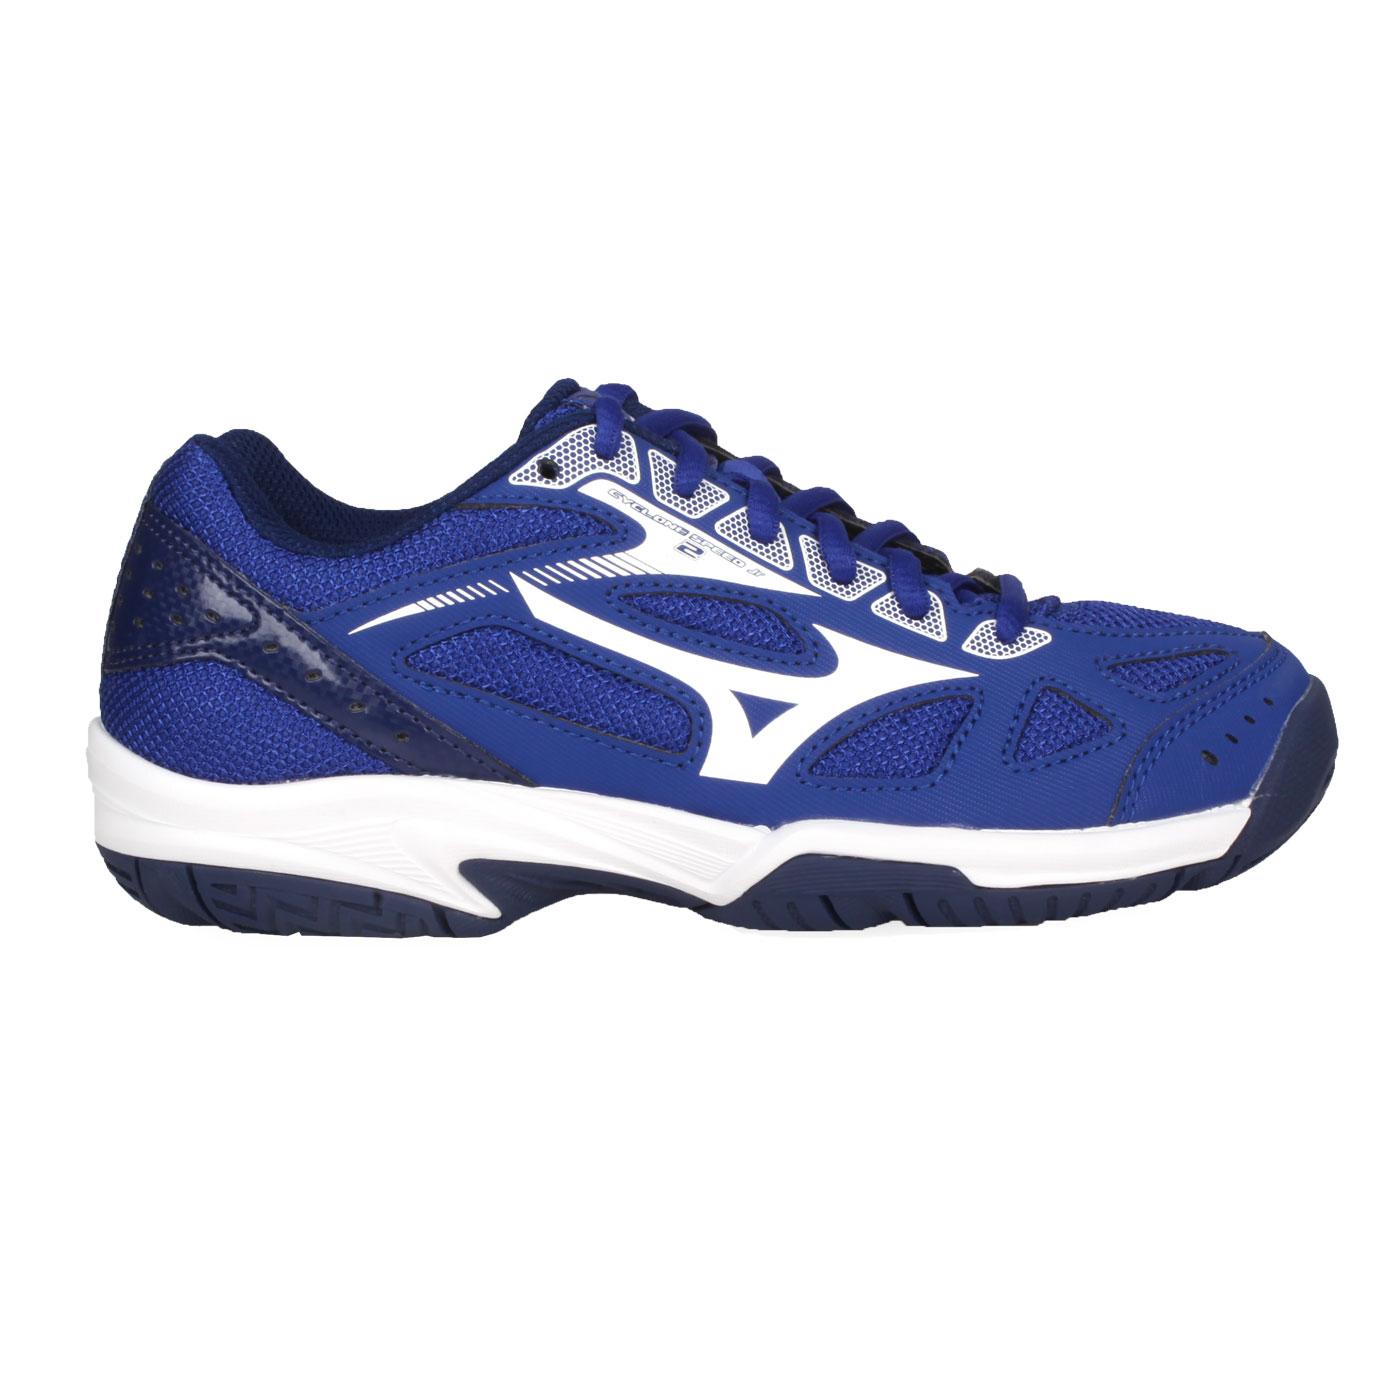 MIZUNO 兒童排球鞋  @CYCLONE SPEED 2 Jr.@V1GD191020 - 深藍白